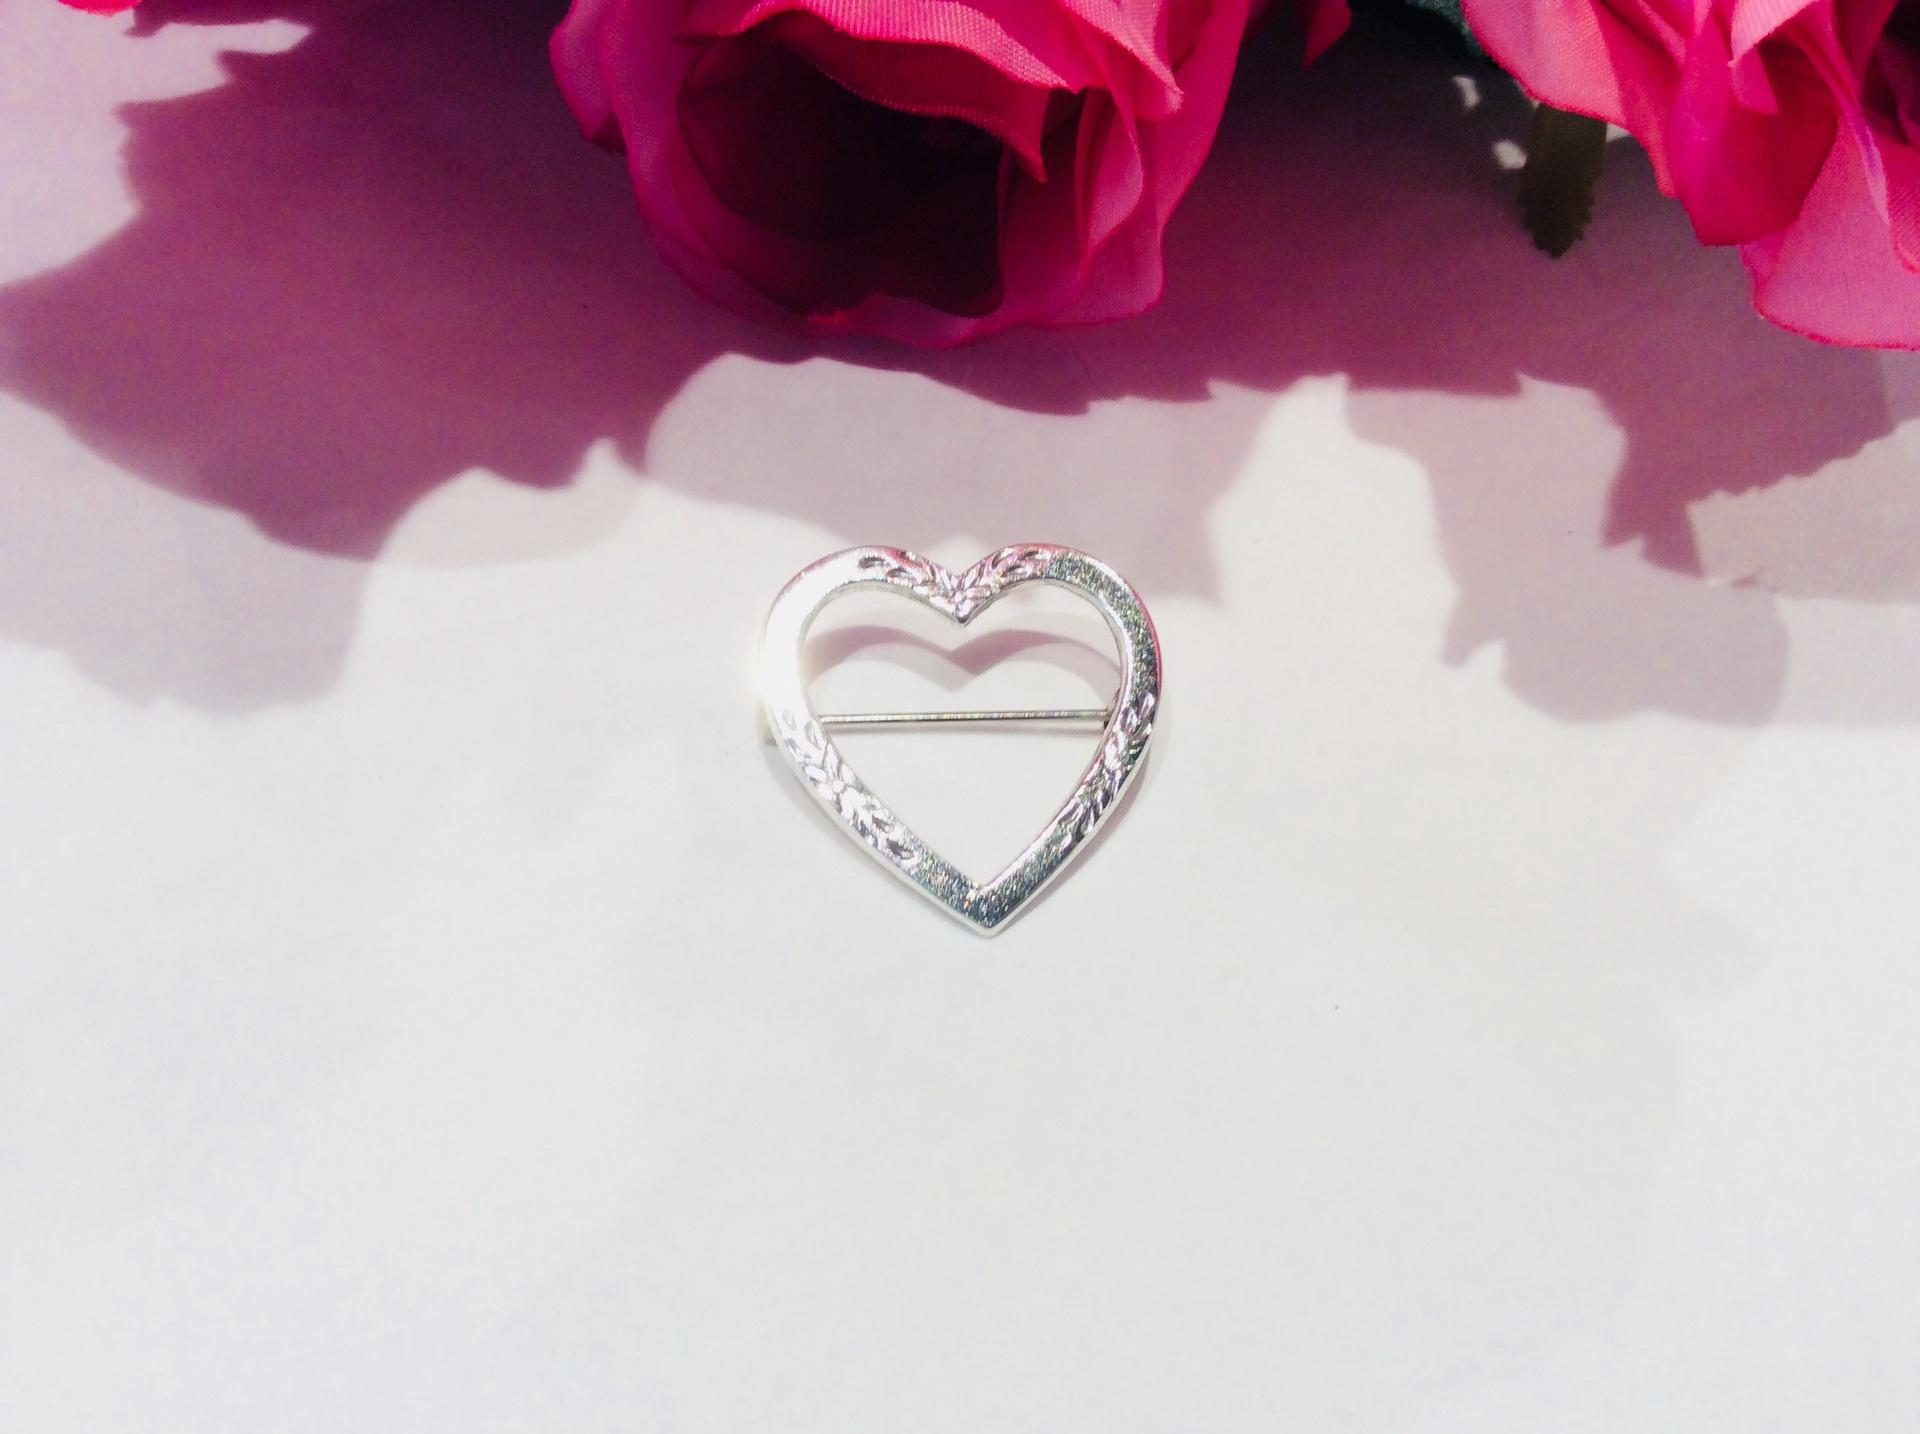 Vintage Sterling Silver Etched Heart Brooch